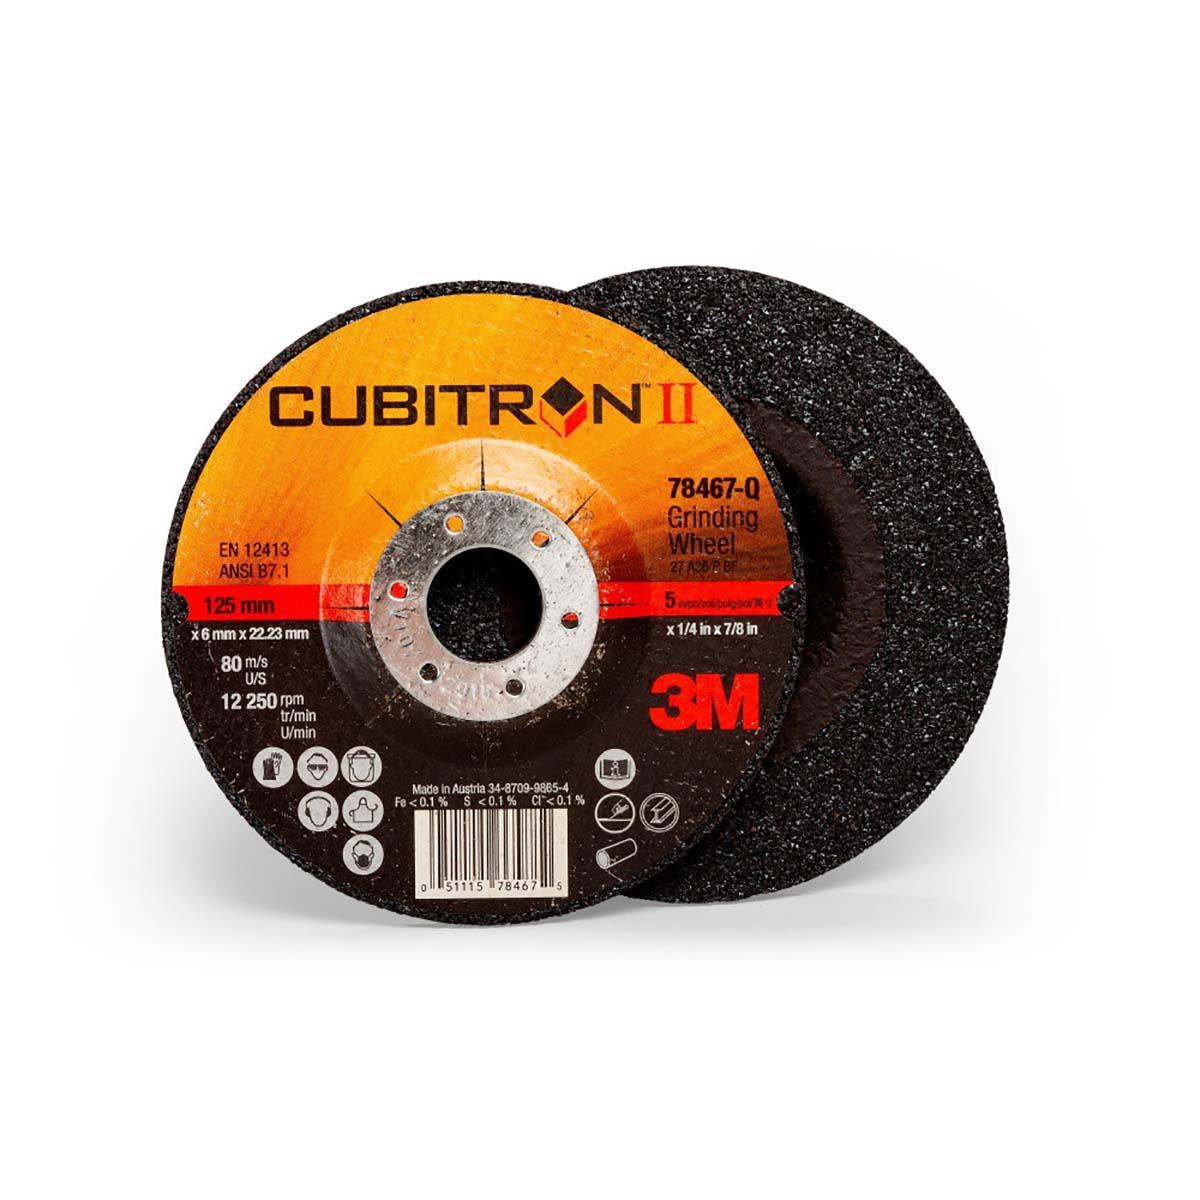 3M Cubitron II Depressed Center Grinding Wheel T27  (78467-Q)  5 in x 1/4 in x 7/8 in